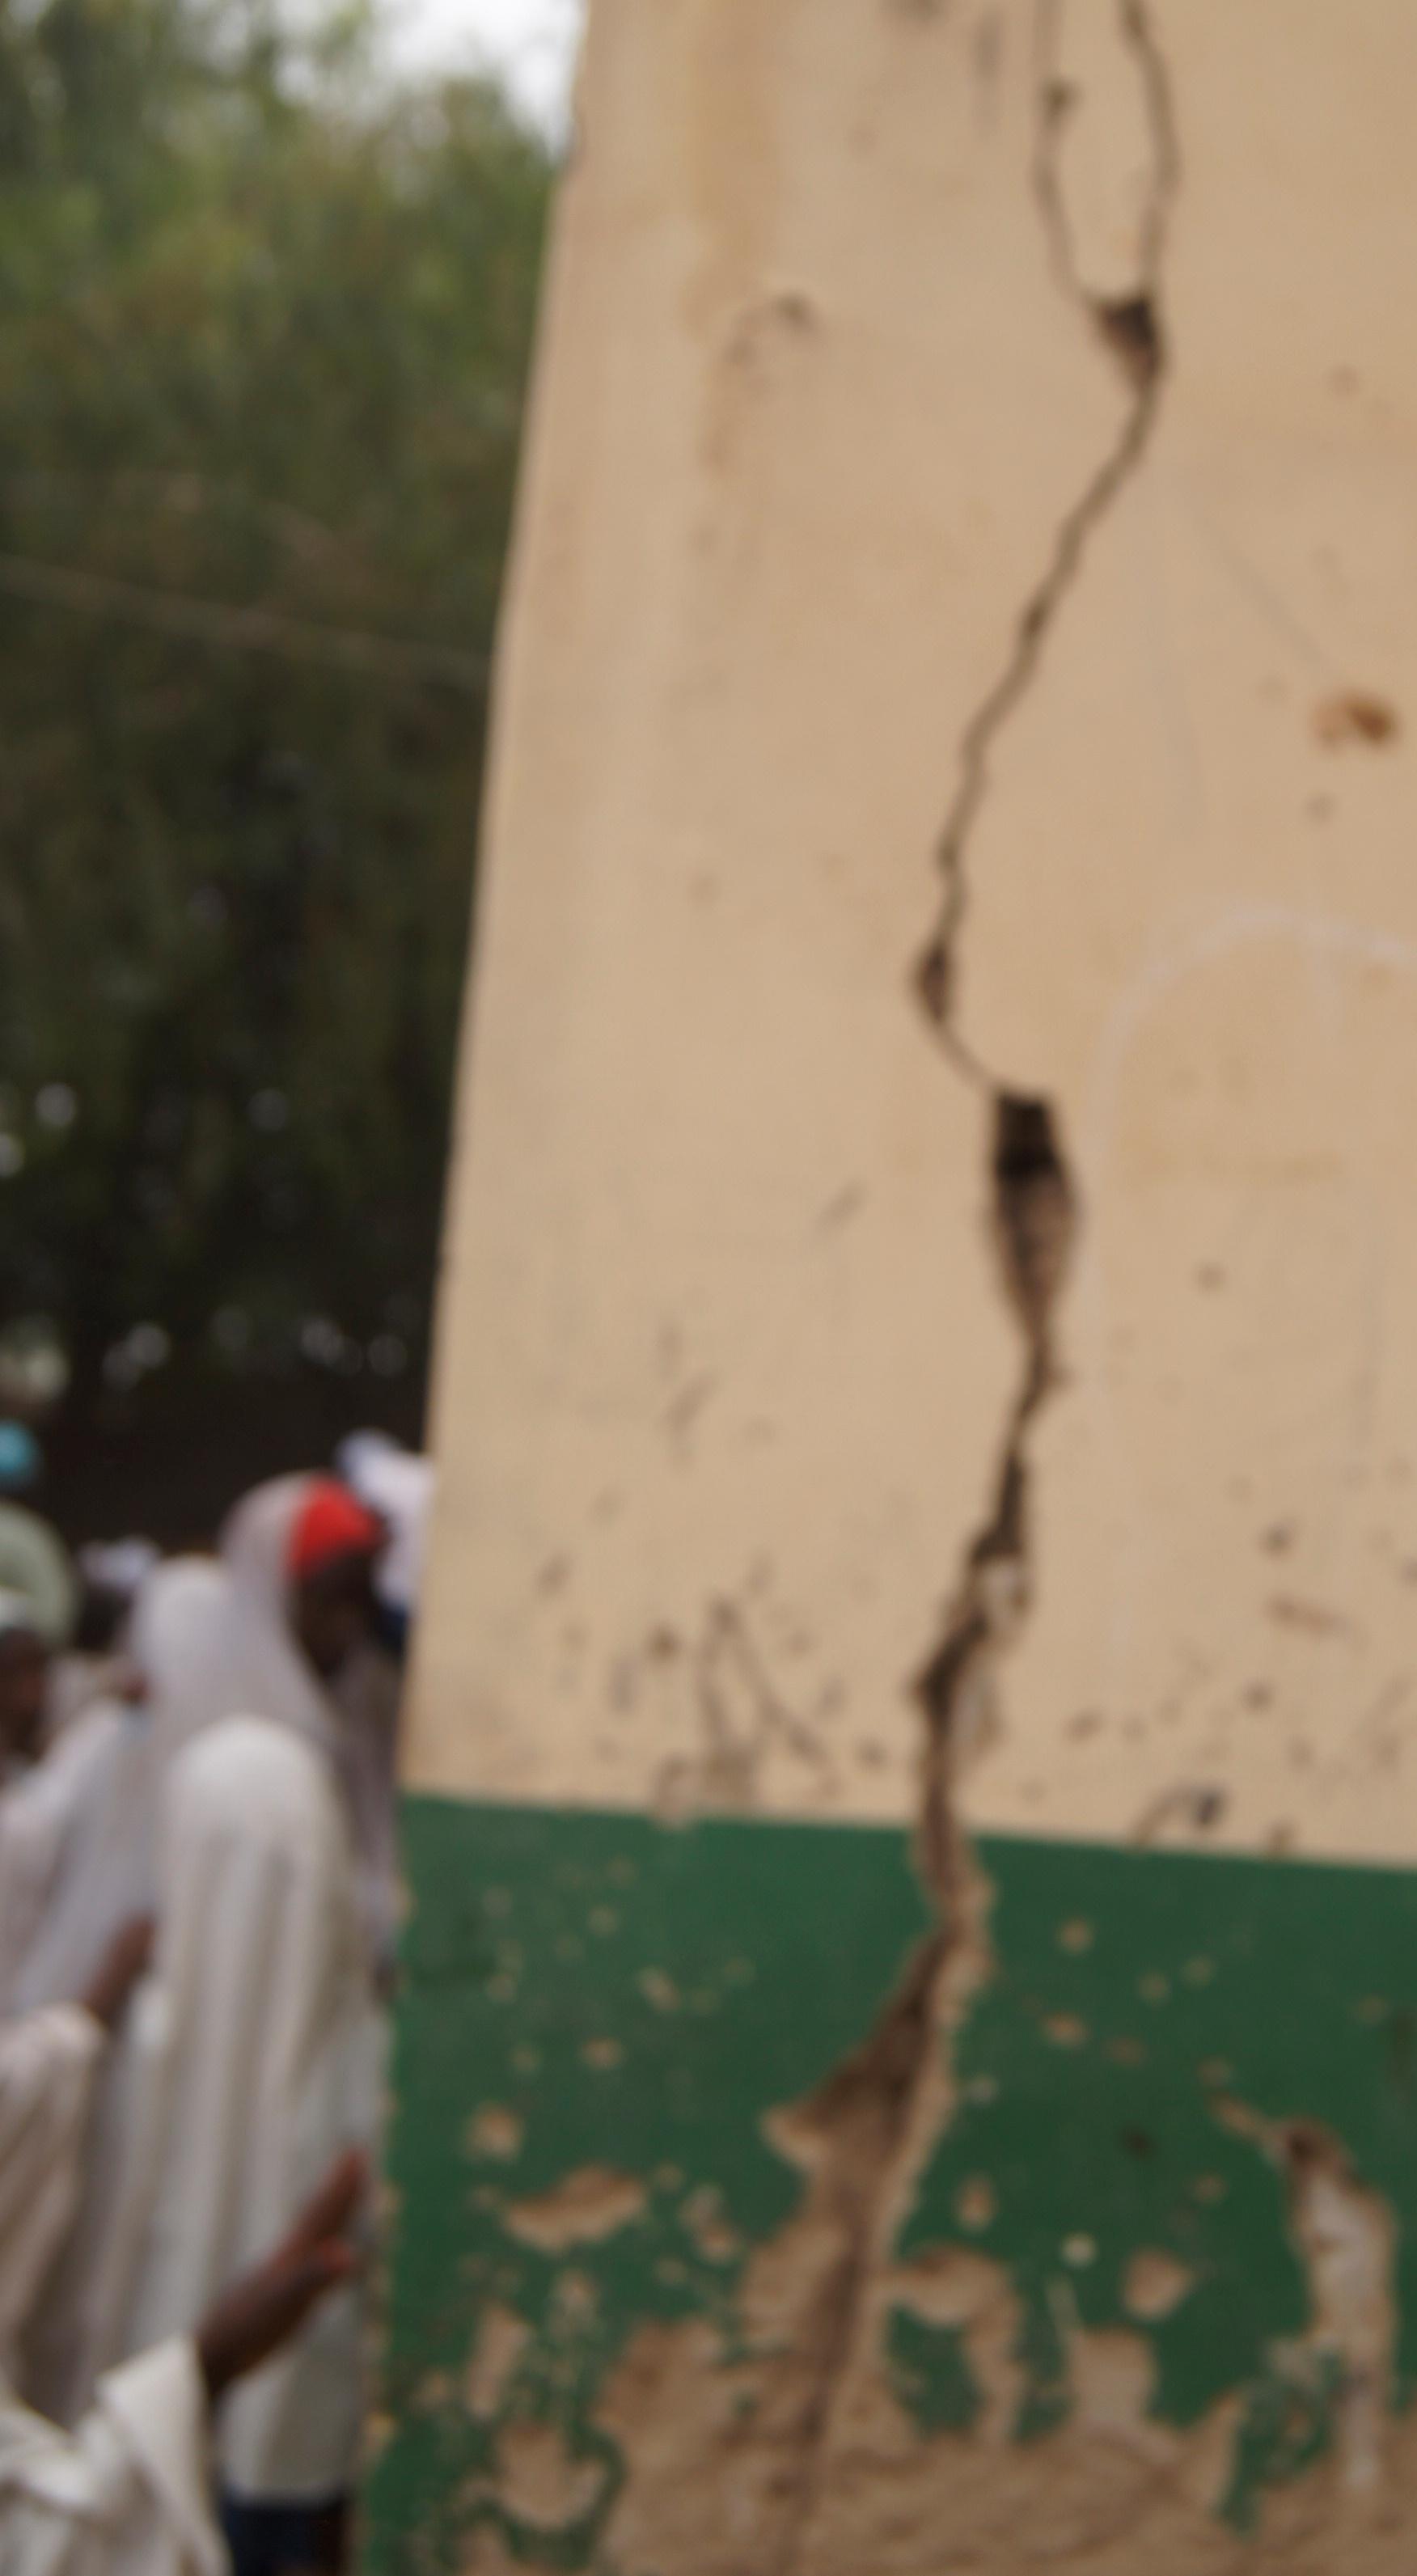 Massive cracks on classroom wall